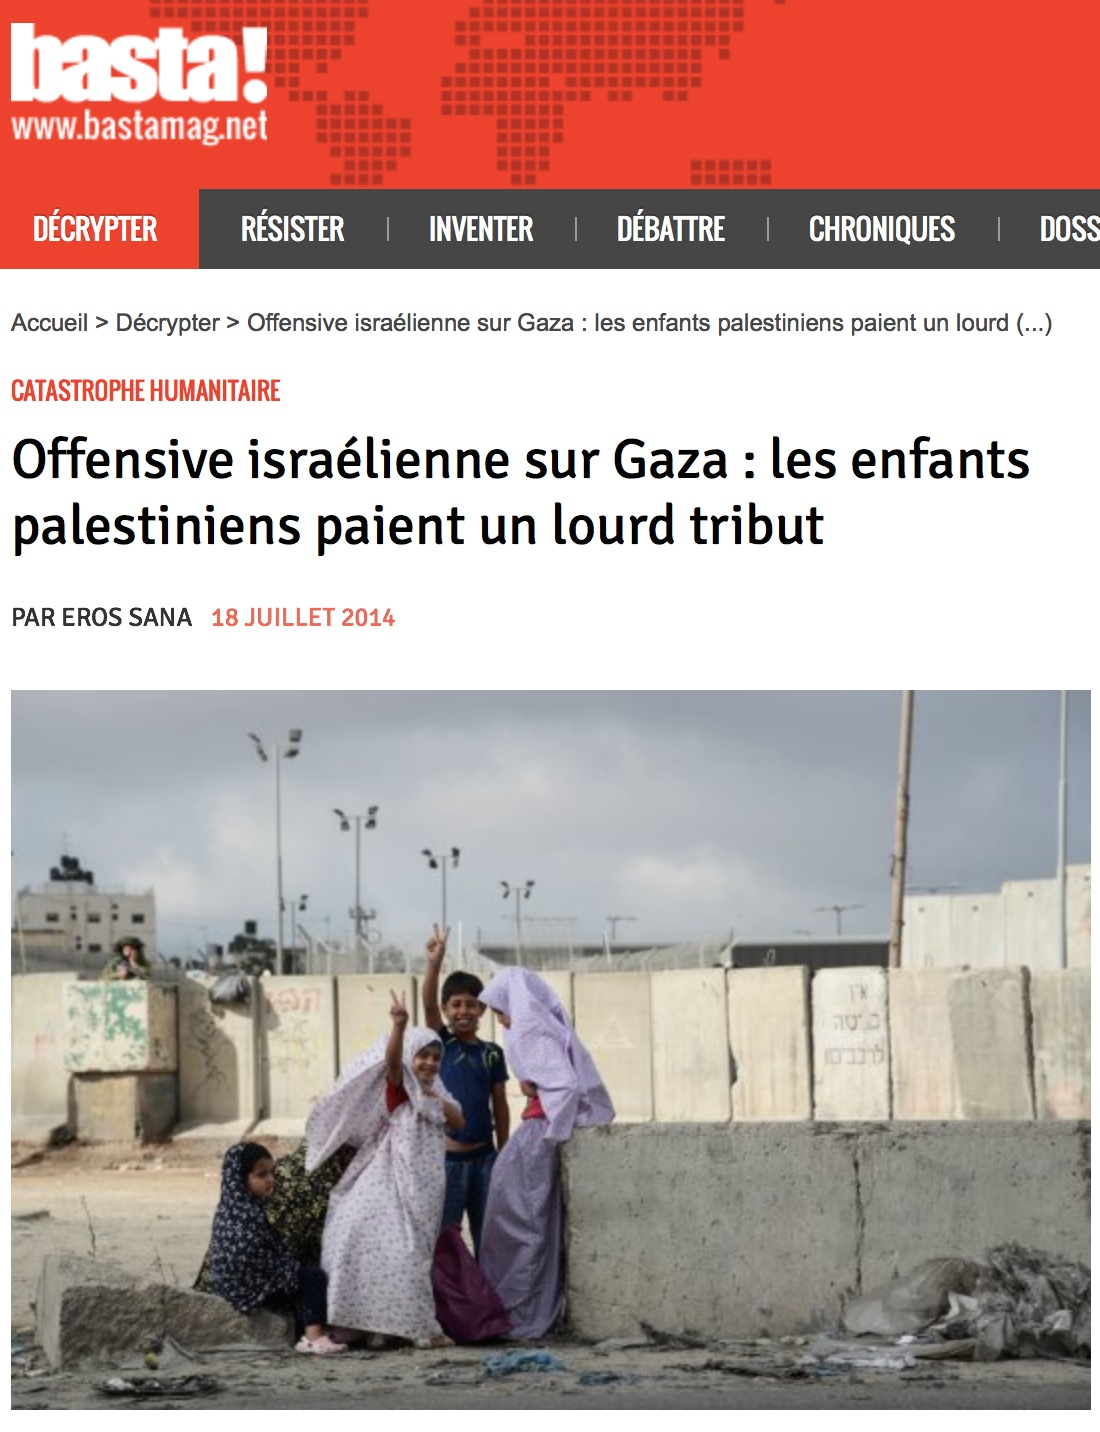 Offensive israélienne à Gaza : reportage